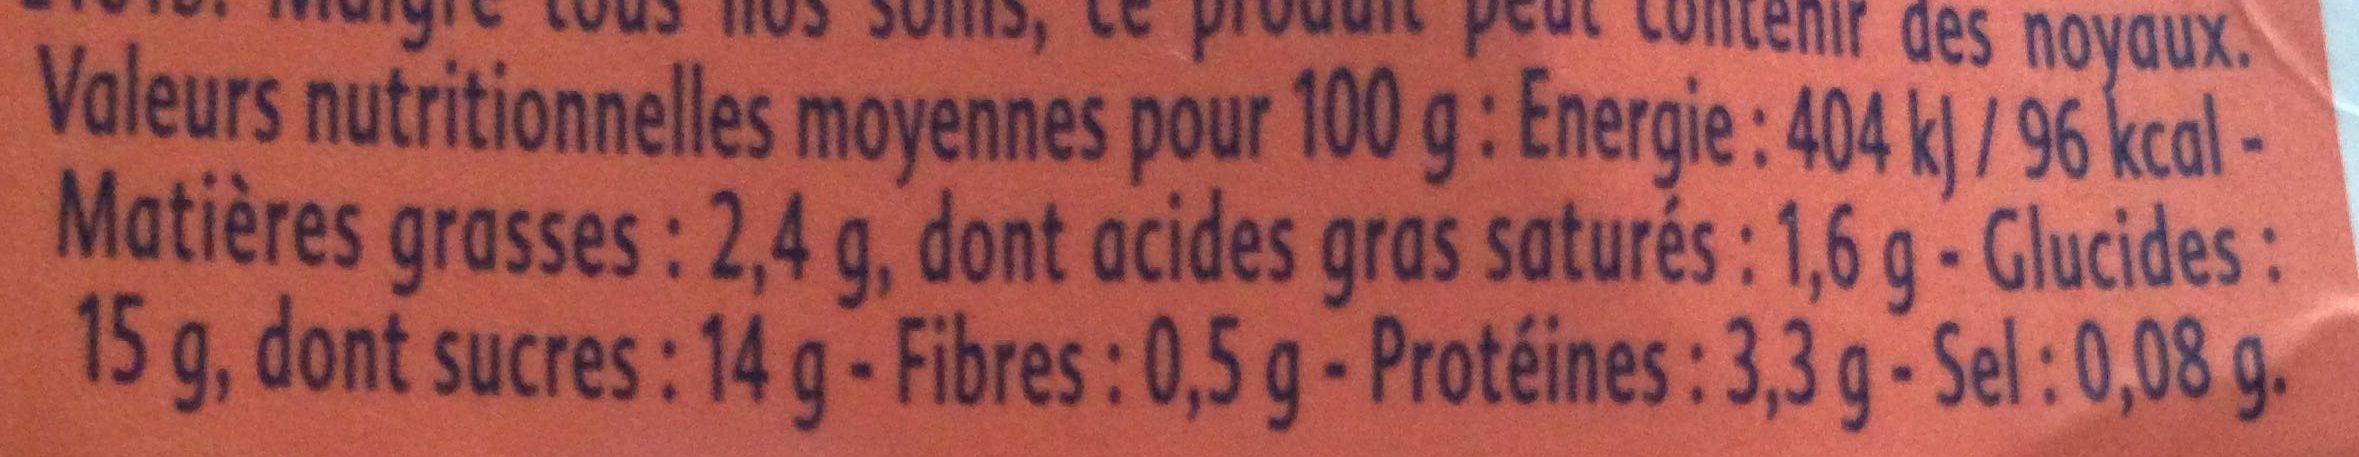 Yaourt Gourmand -  Pêche du Roussillon - Nutrition facts